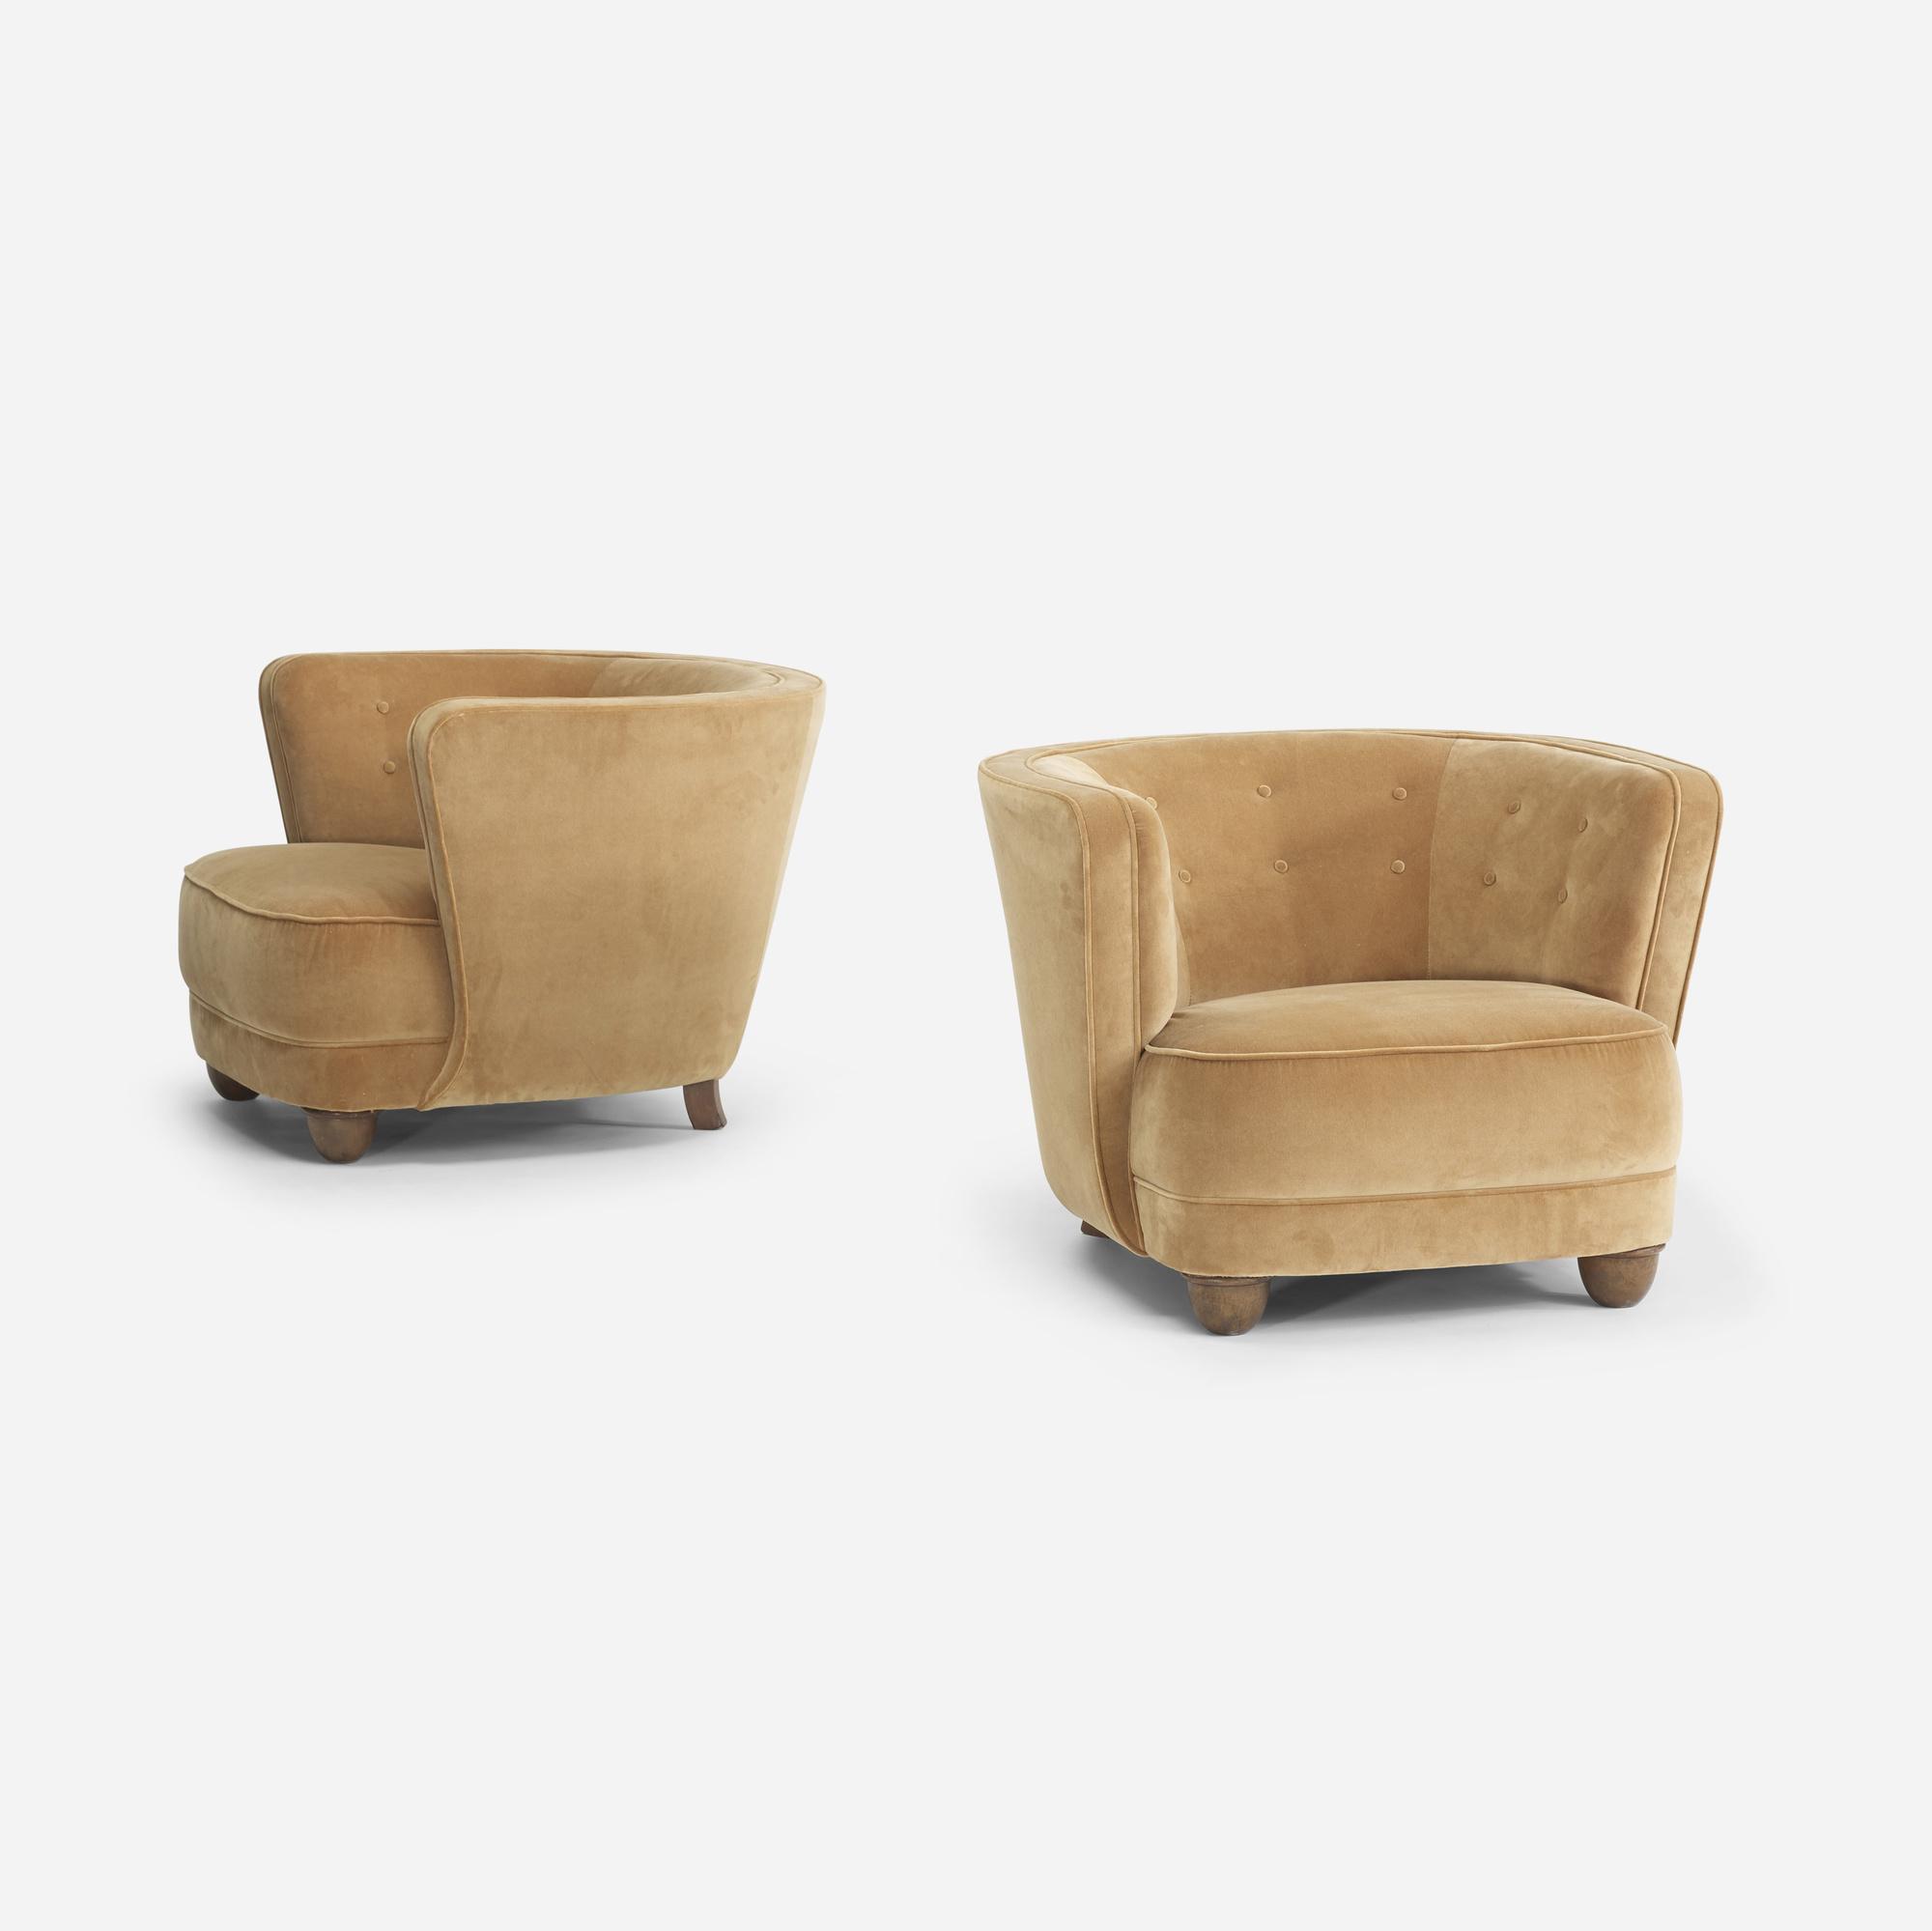 111: Danish Cabinetmaker / lounge chairs, pair (3 of 4)